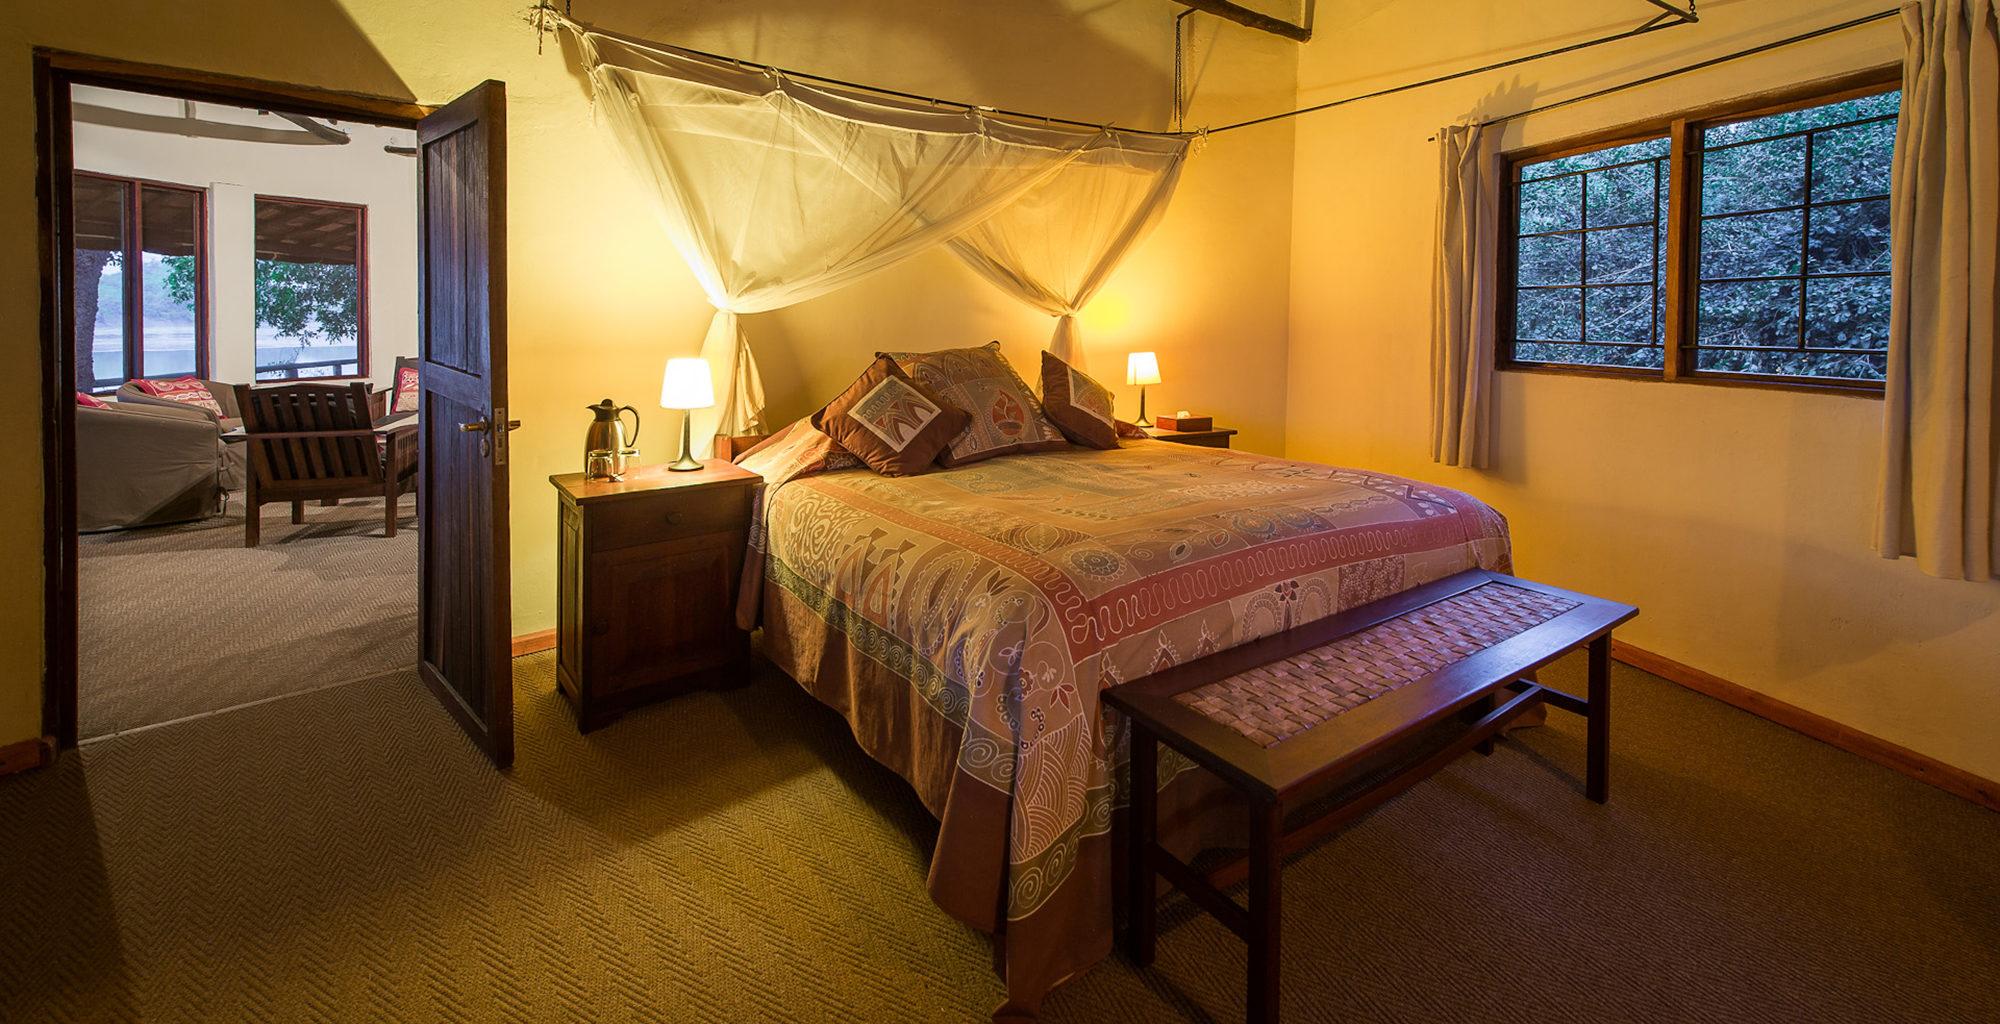 Zambia-Robins-House-Bedroom